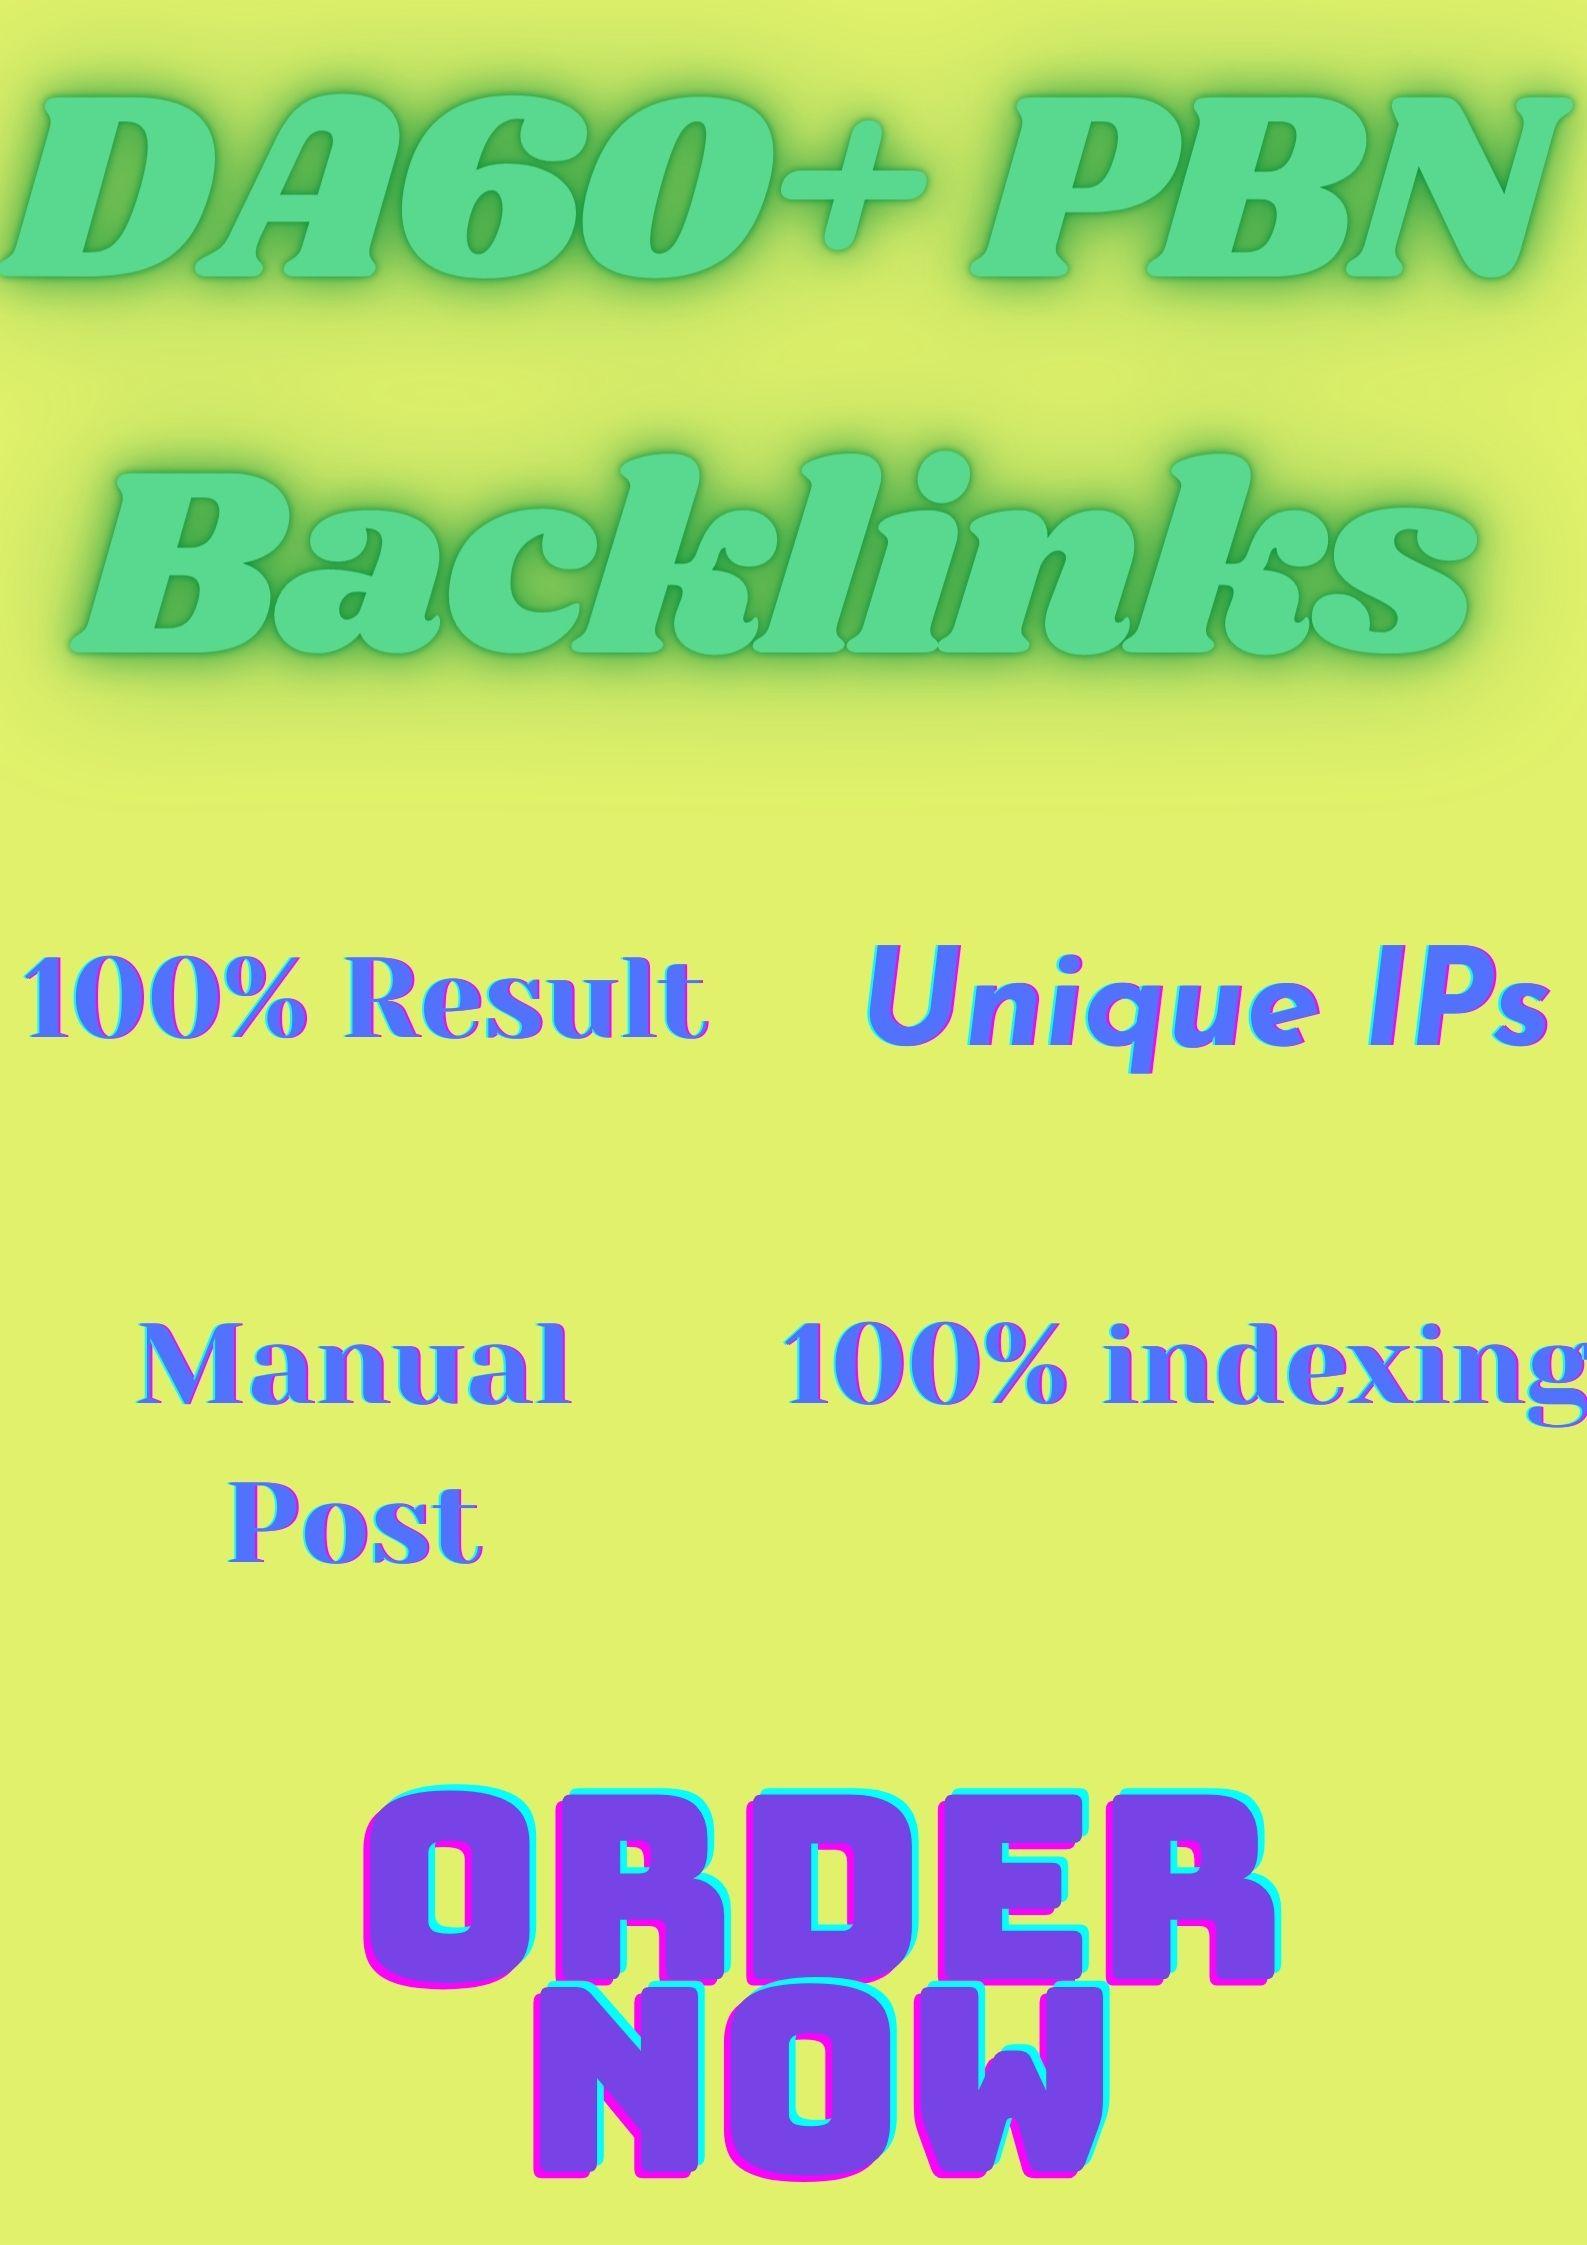 Get 40 High Quality DA 60+ Permanent HomePage PBN Links